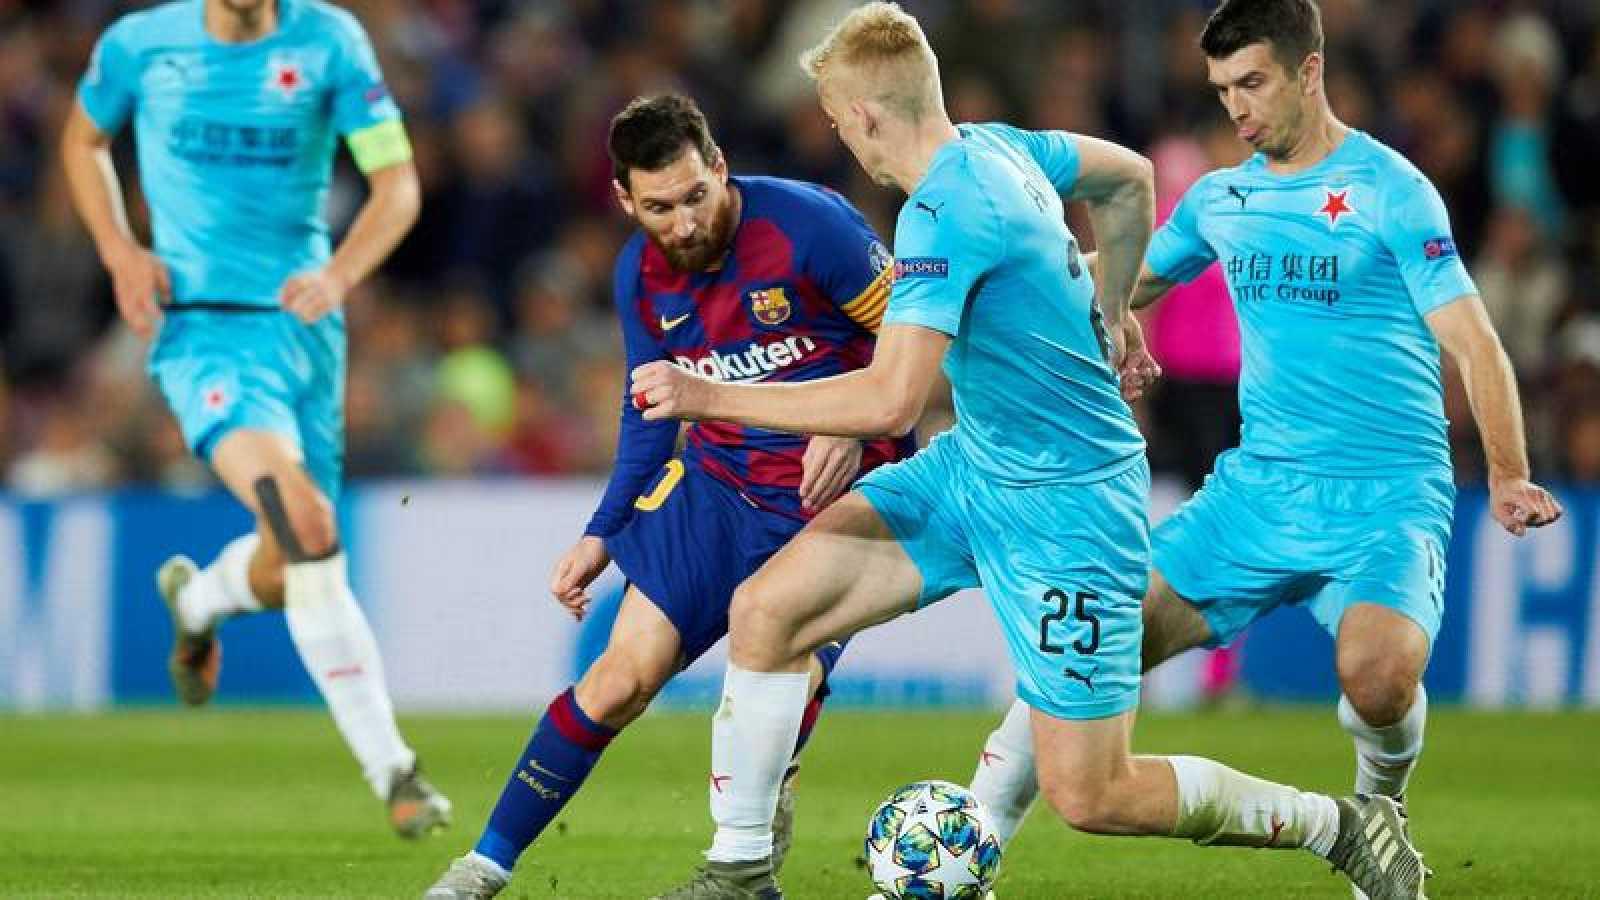 El Barça se atasca ante el Slavia de Praga